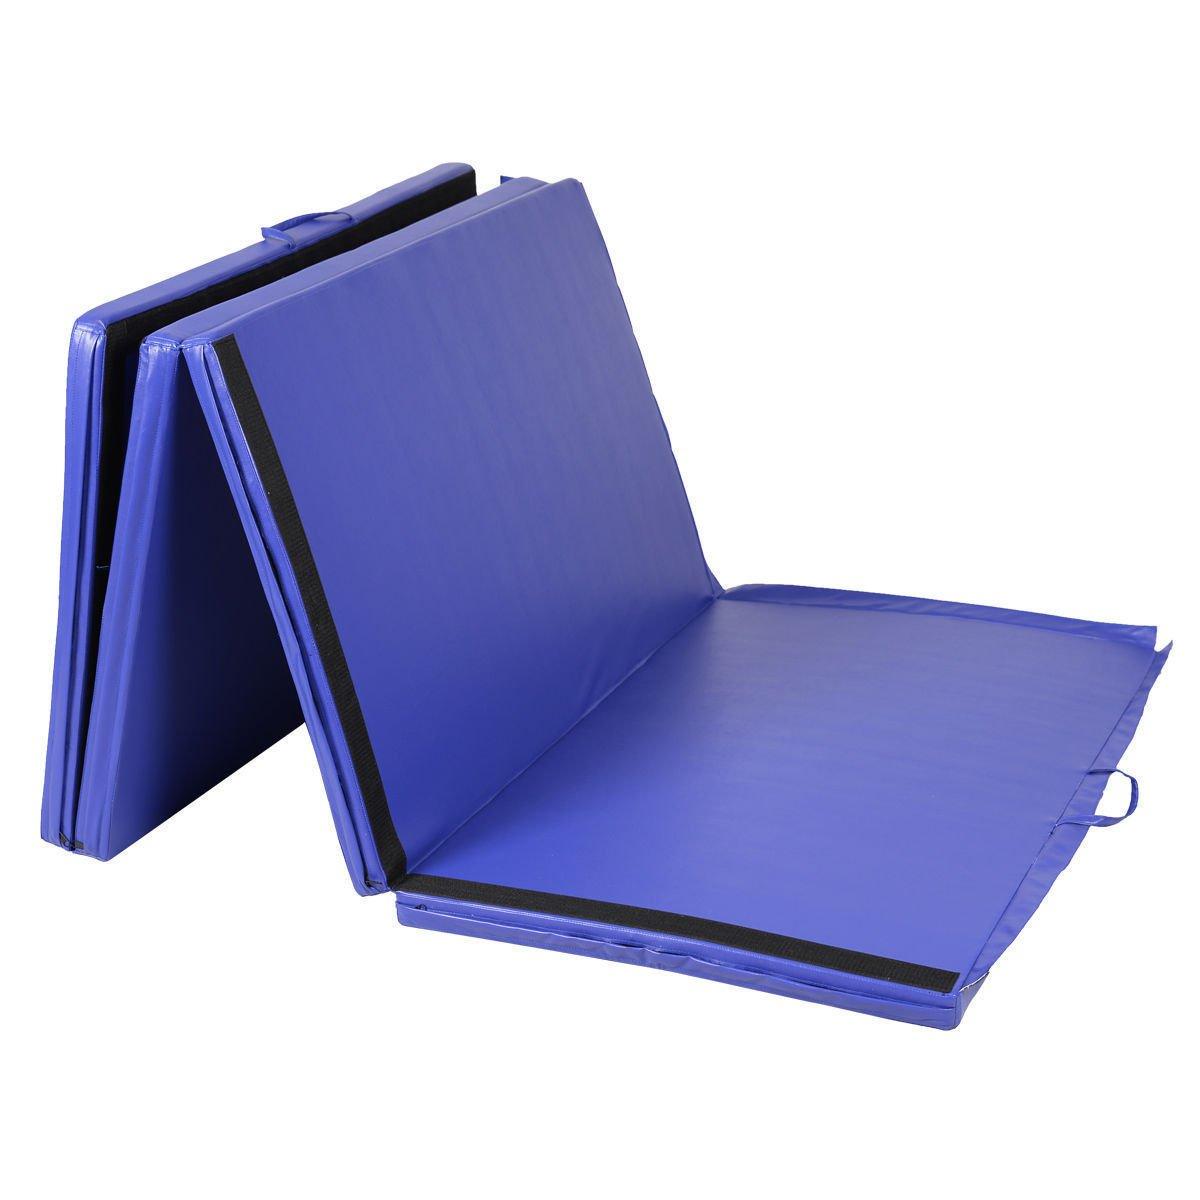 Goplus Folding Gymnastics Gym Exercise Mats 4 X10 X2